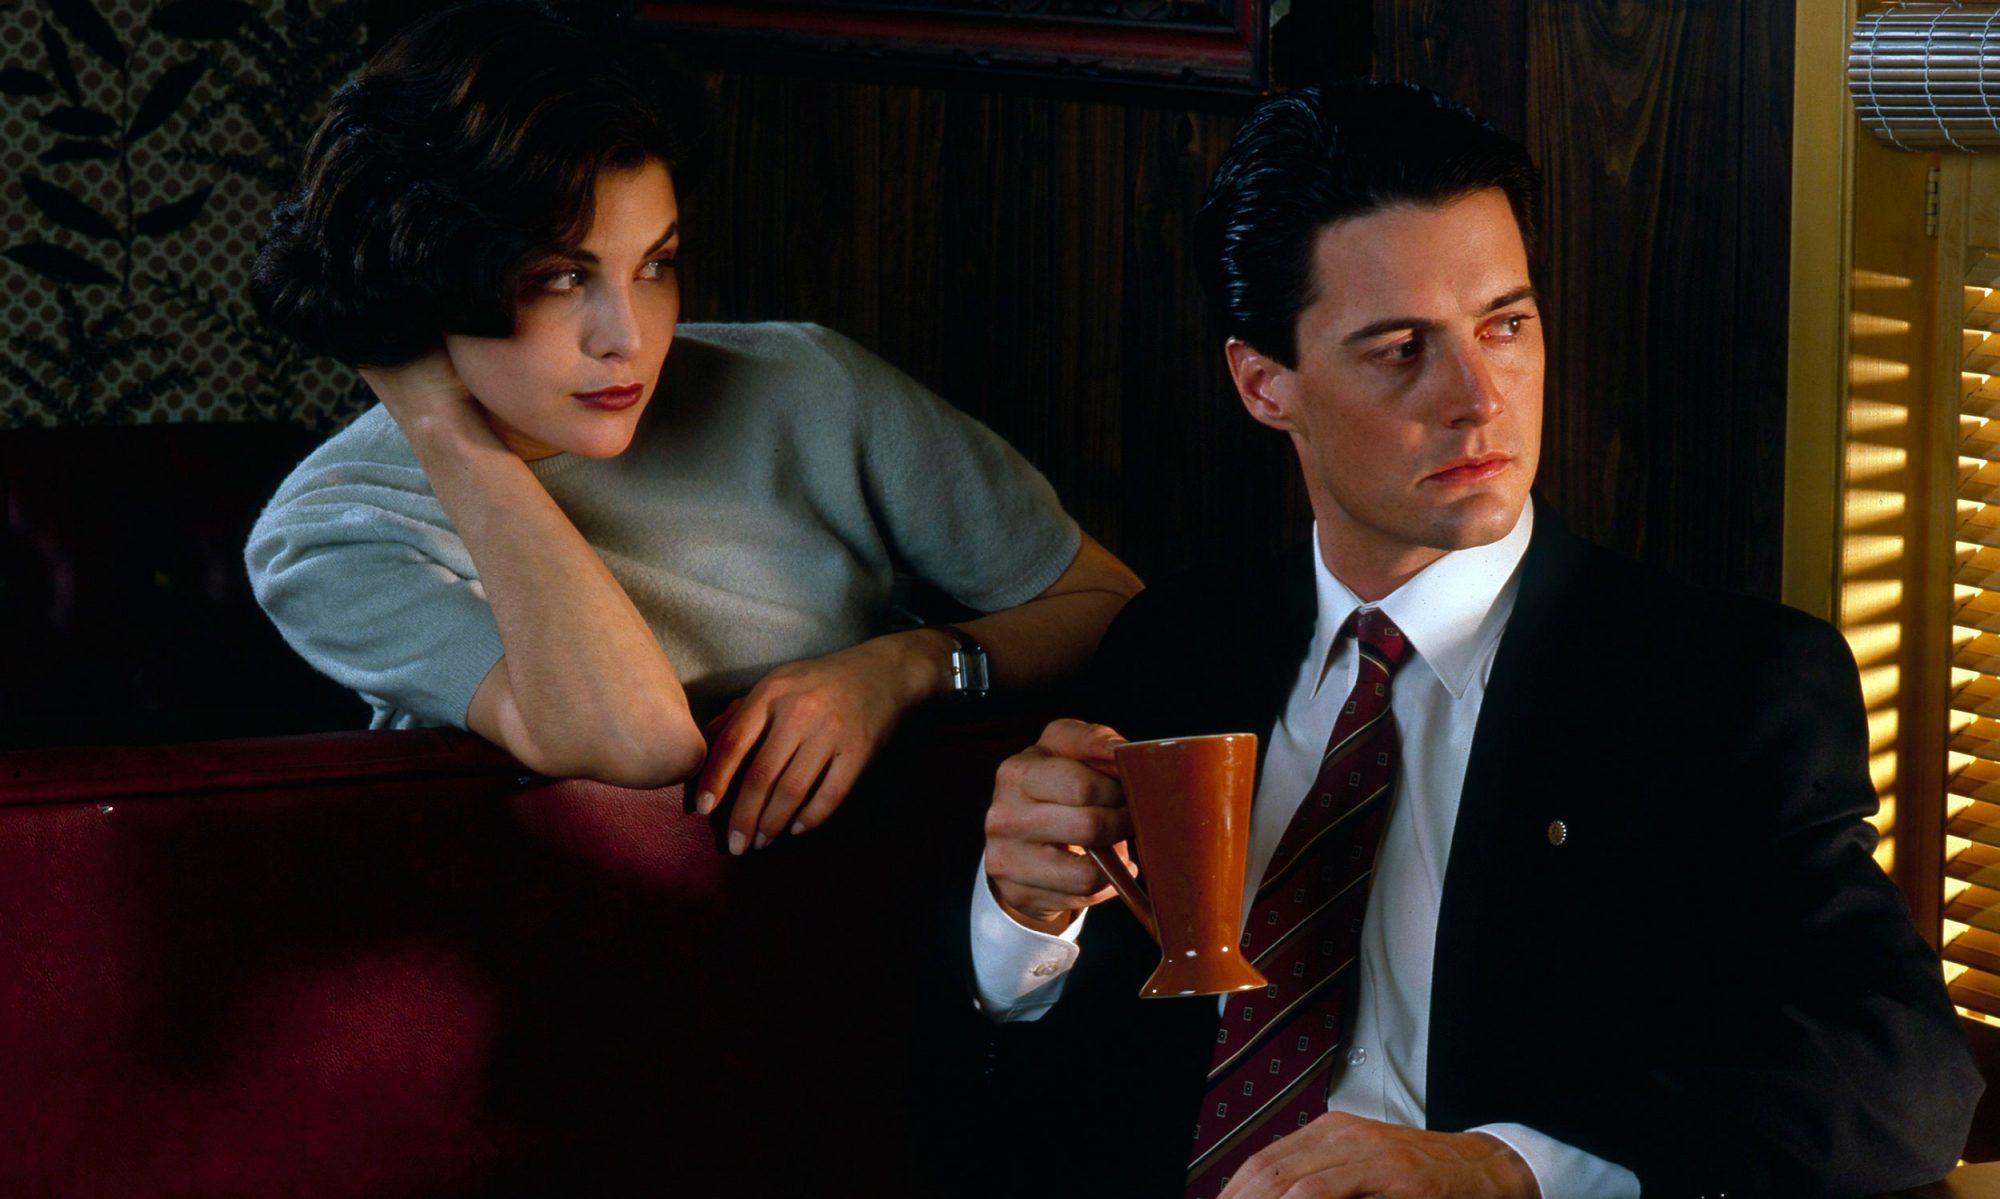 EC: How 'Twin Peaks' Changed TV Breakfast Forever